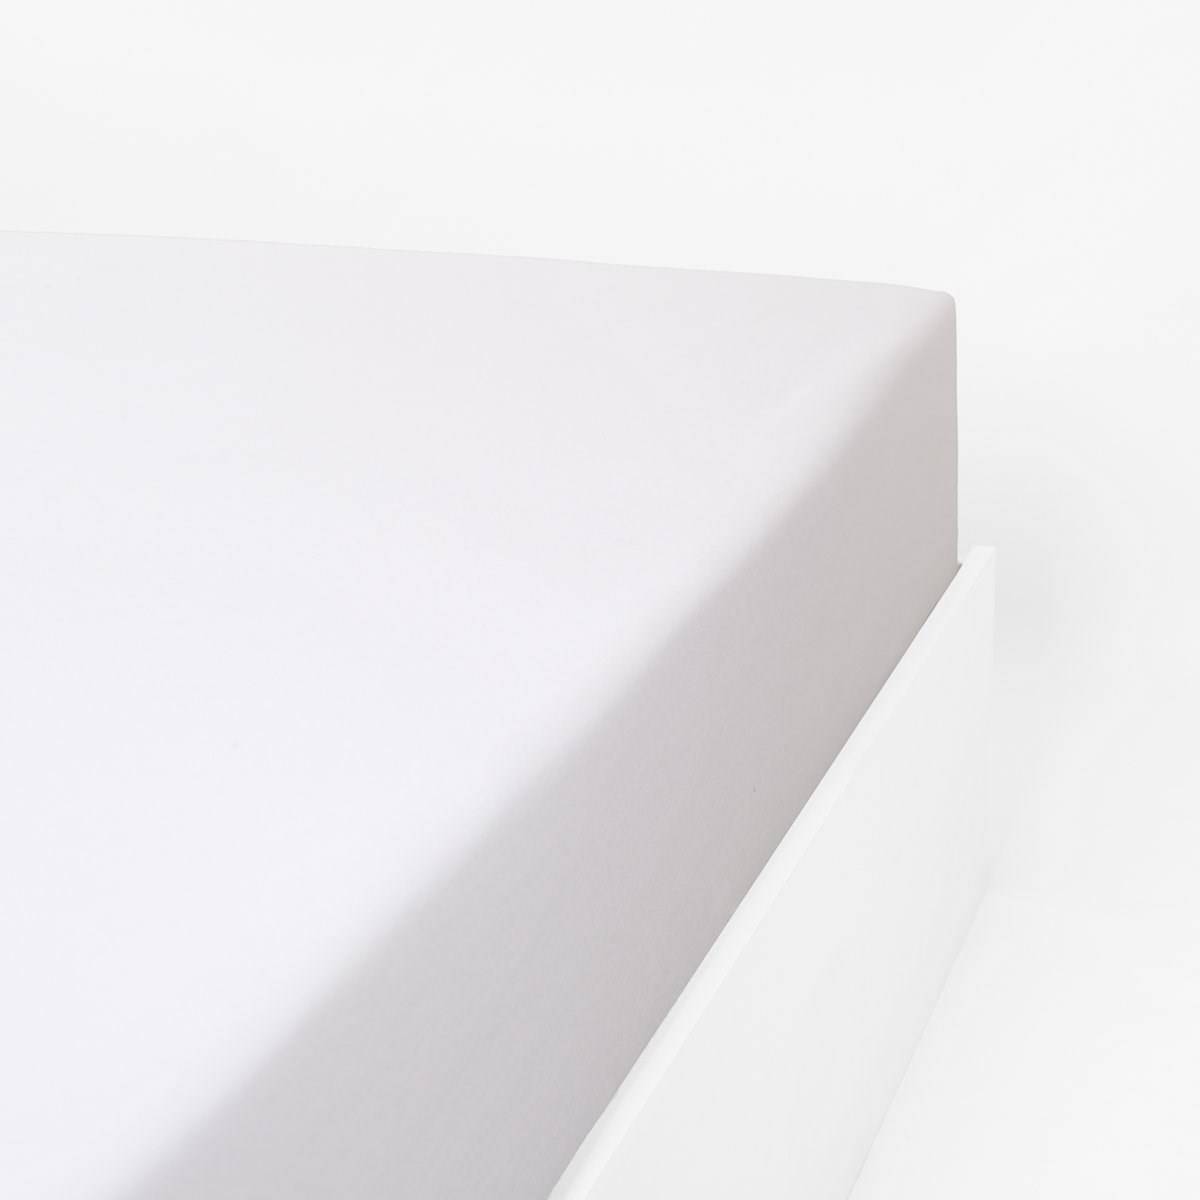 Drap housse flanelle en Molleton Blanc 200x200 cm